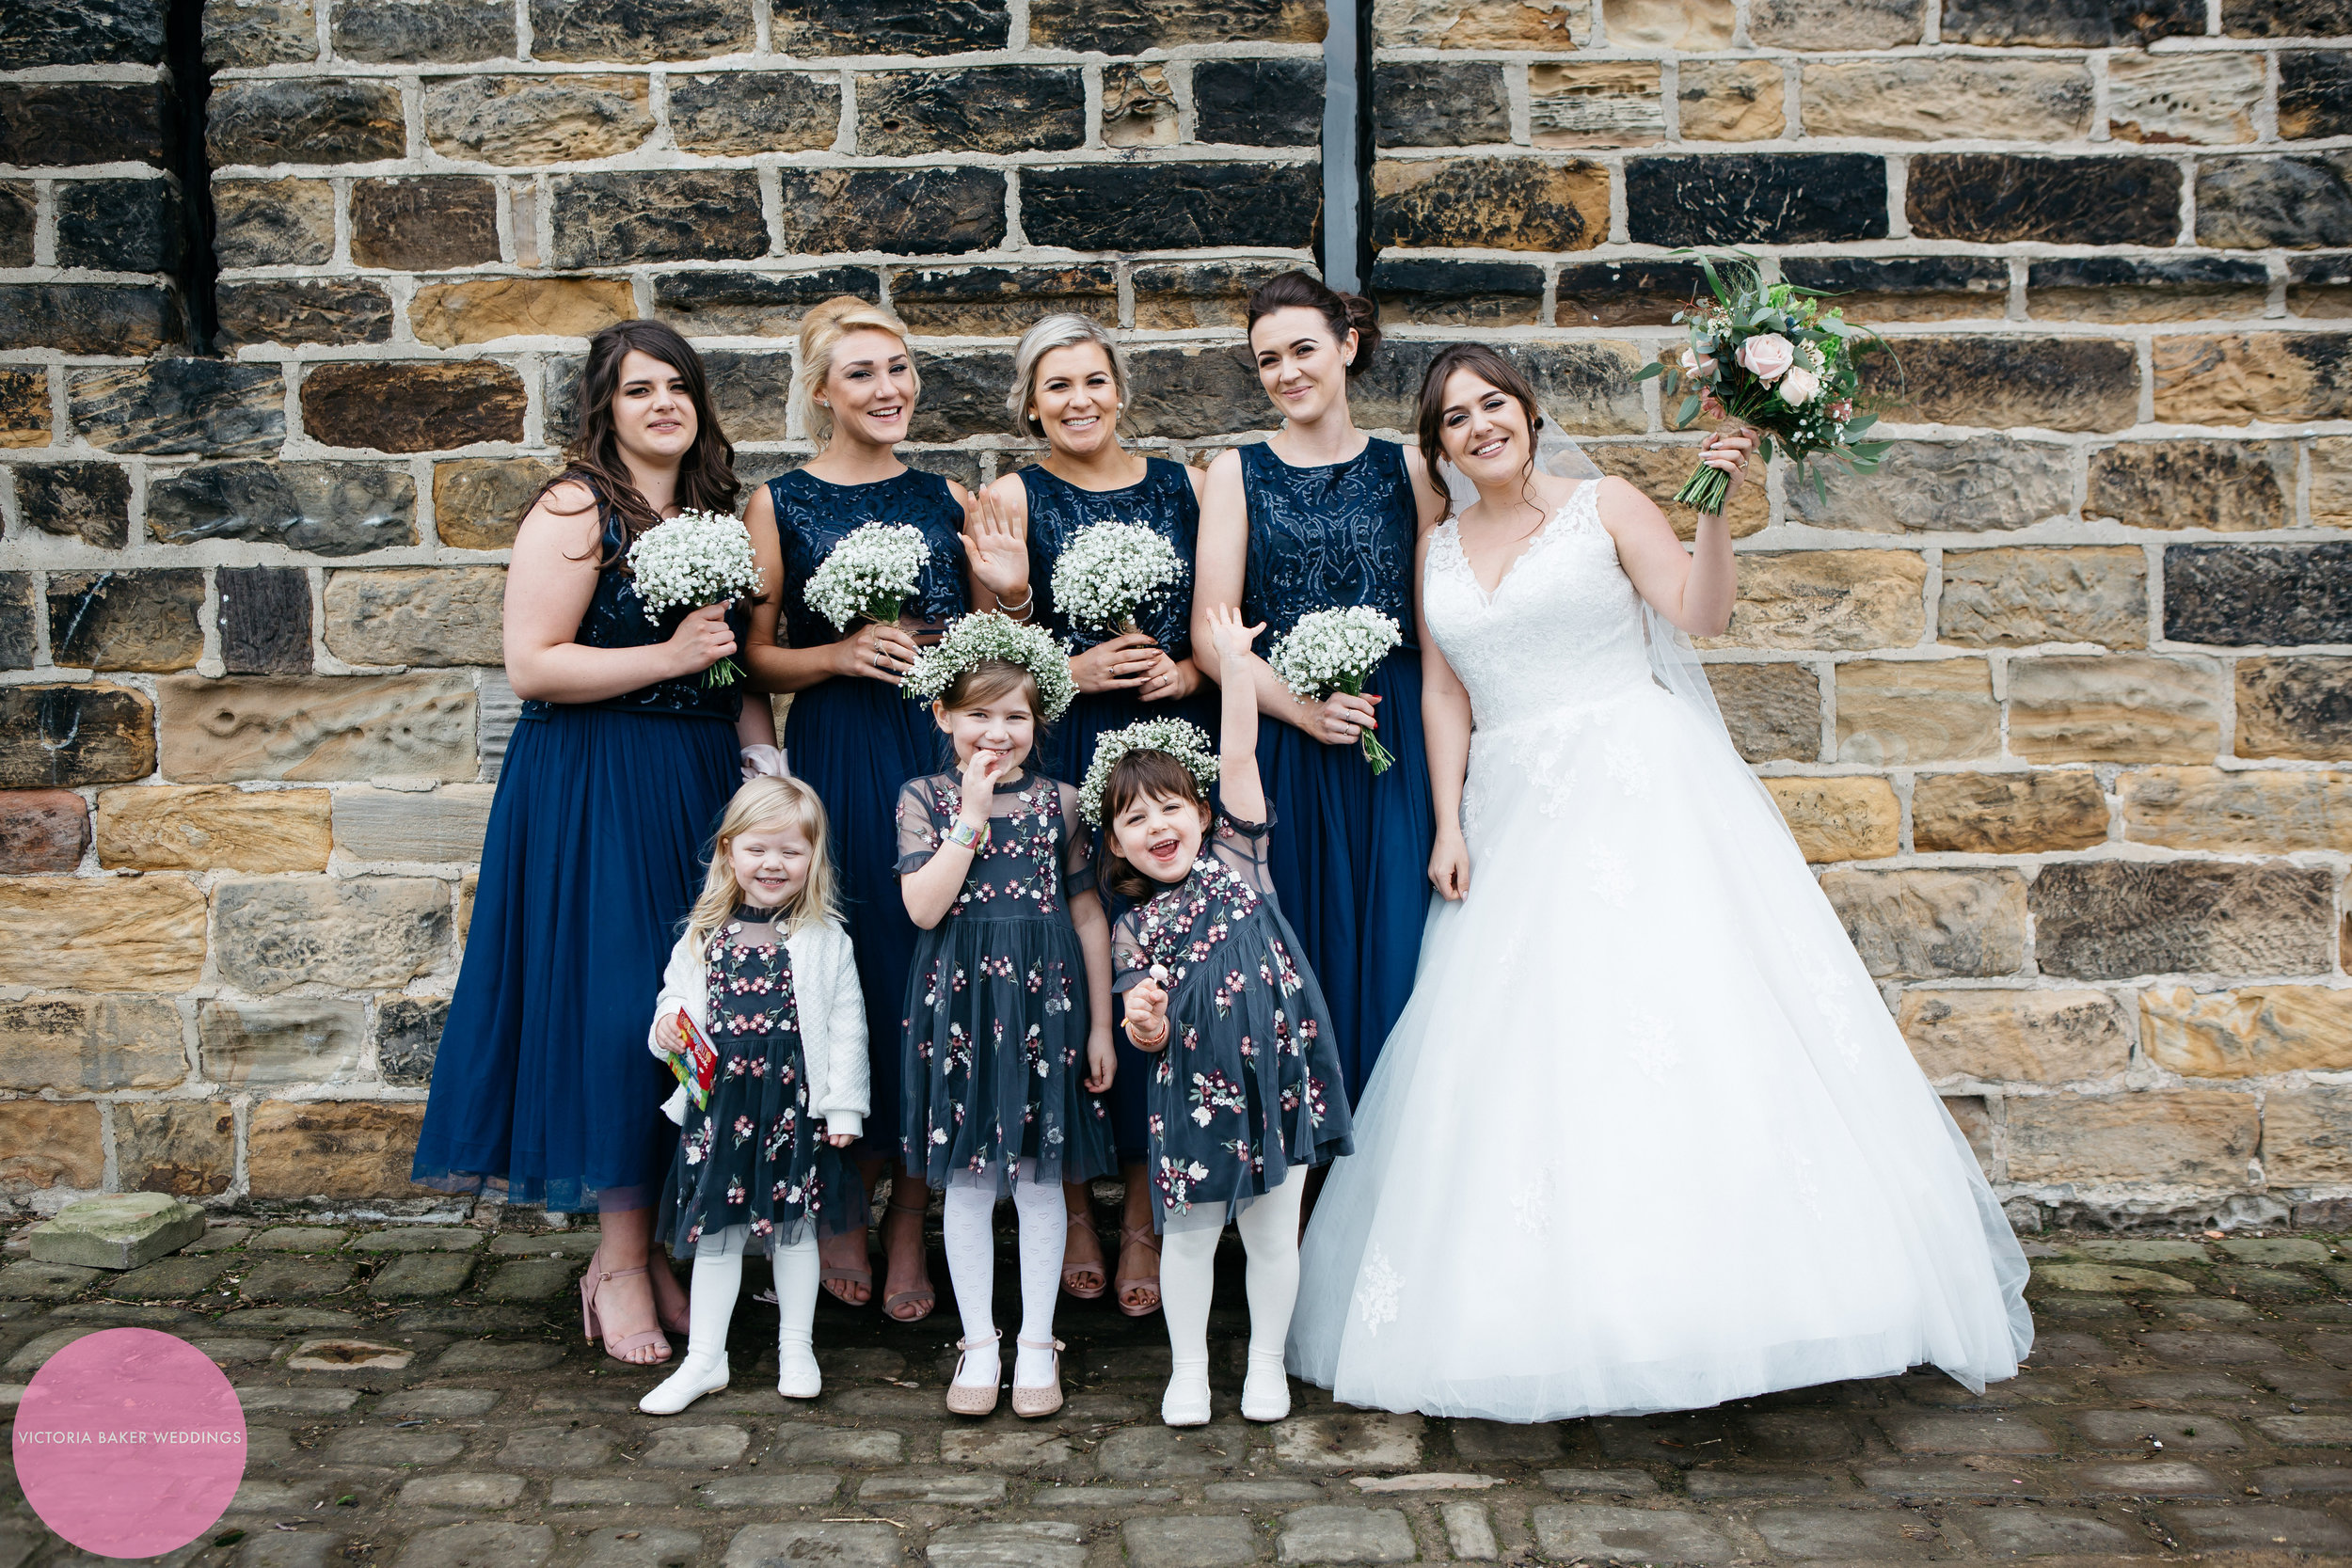 Bridal Party | Wedding Photography Leeds